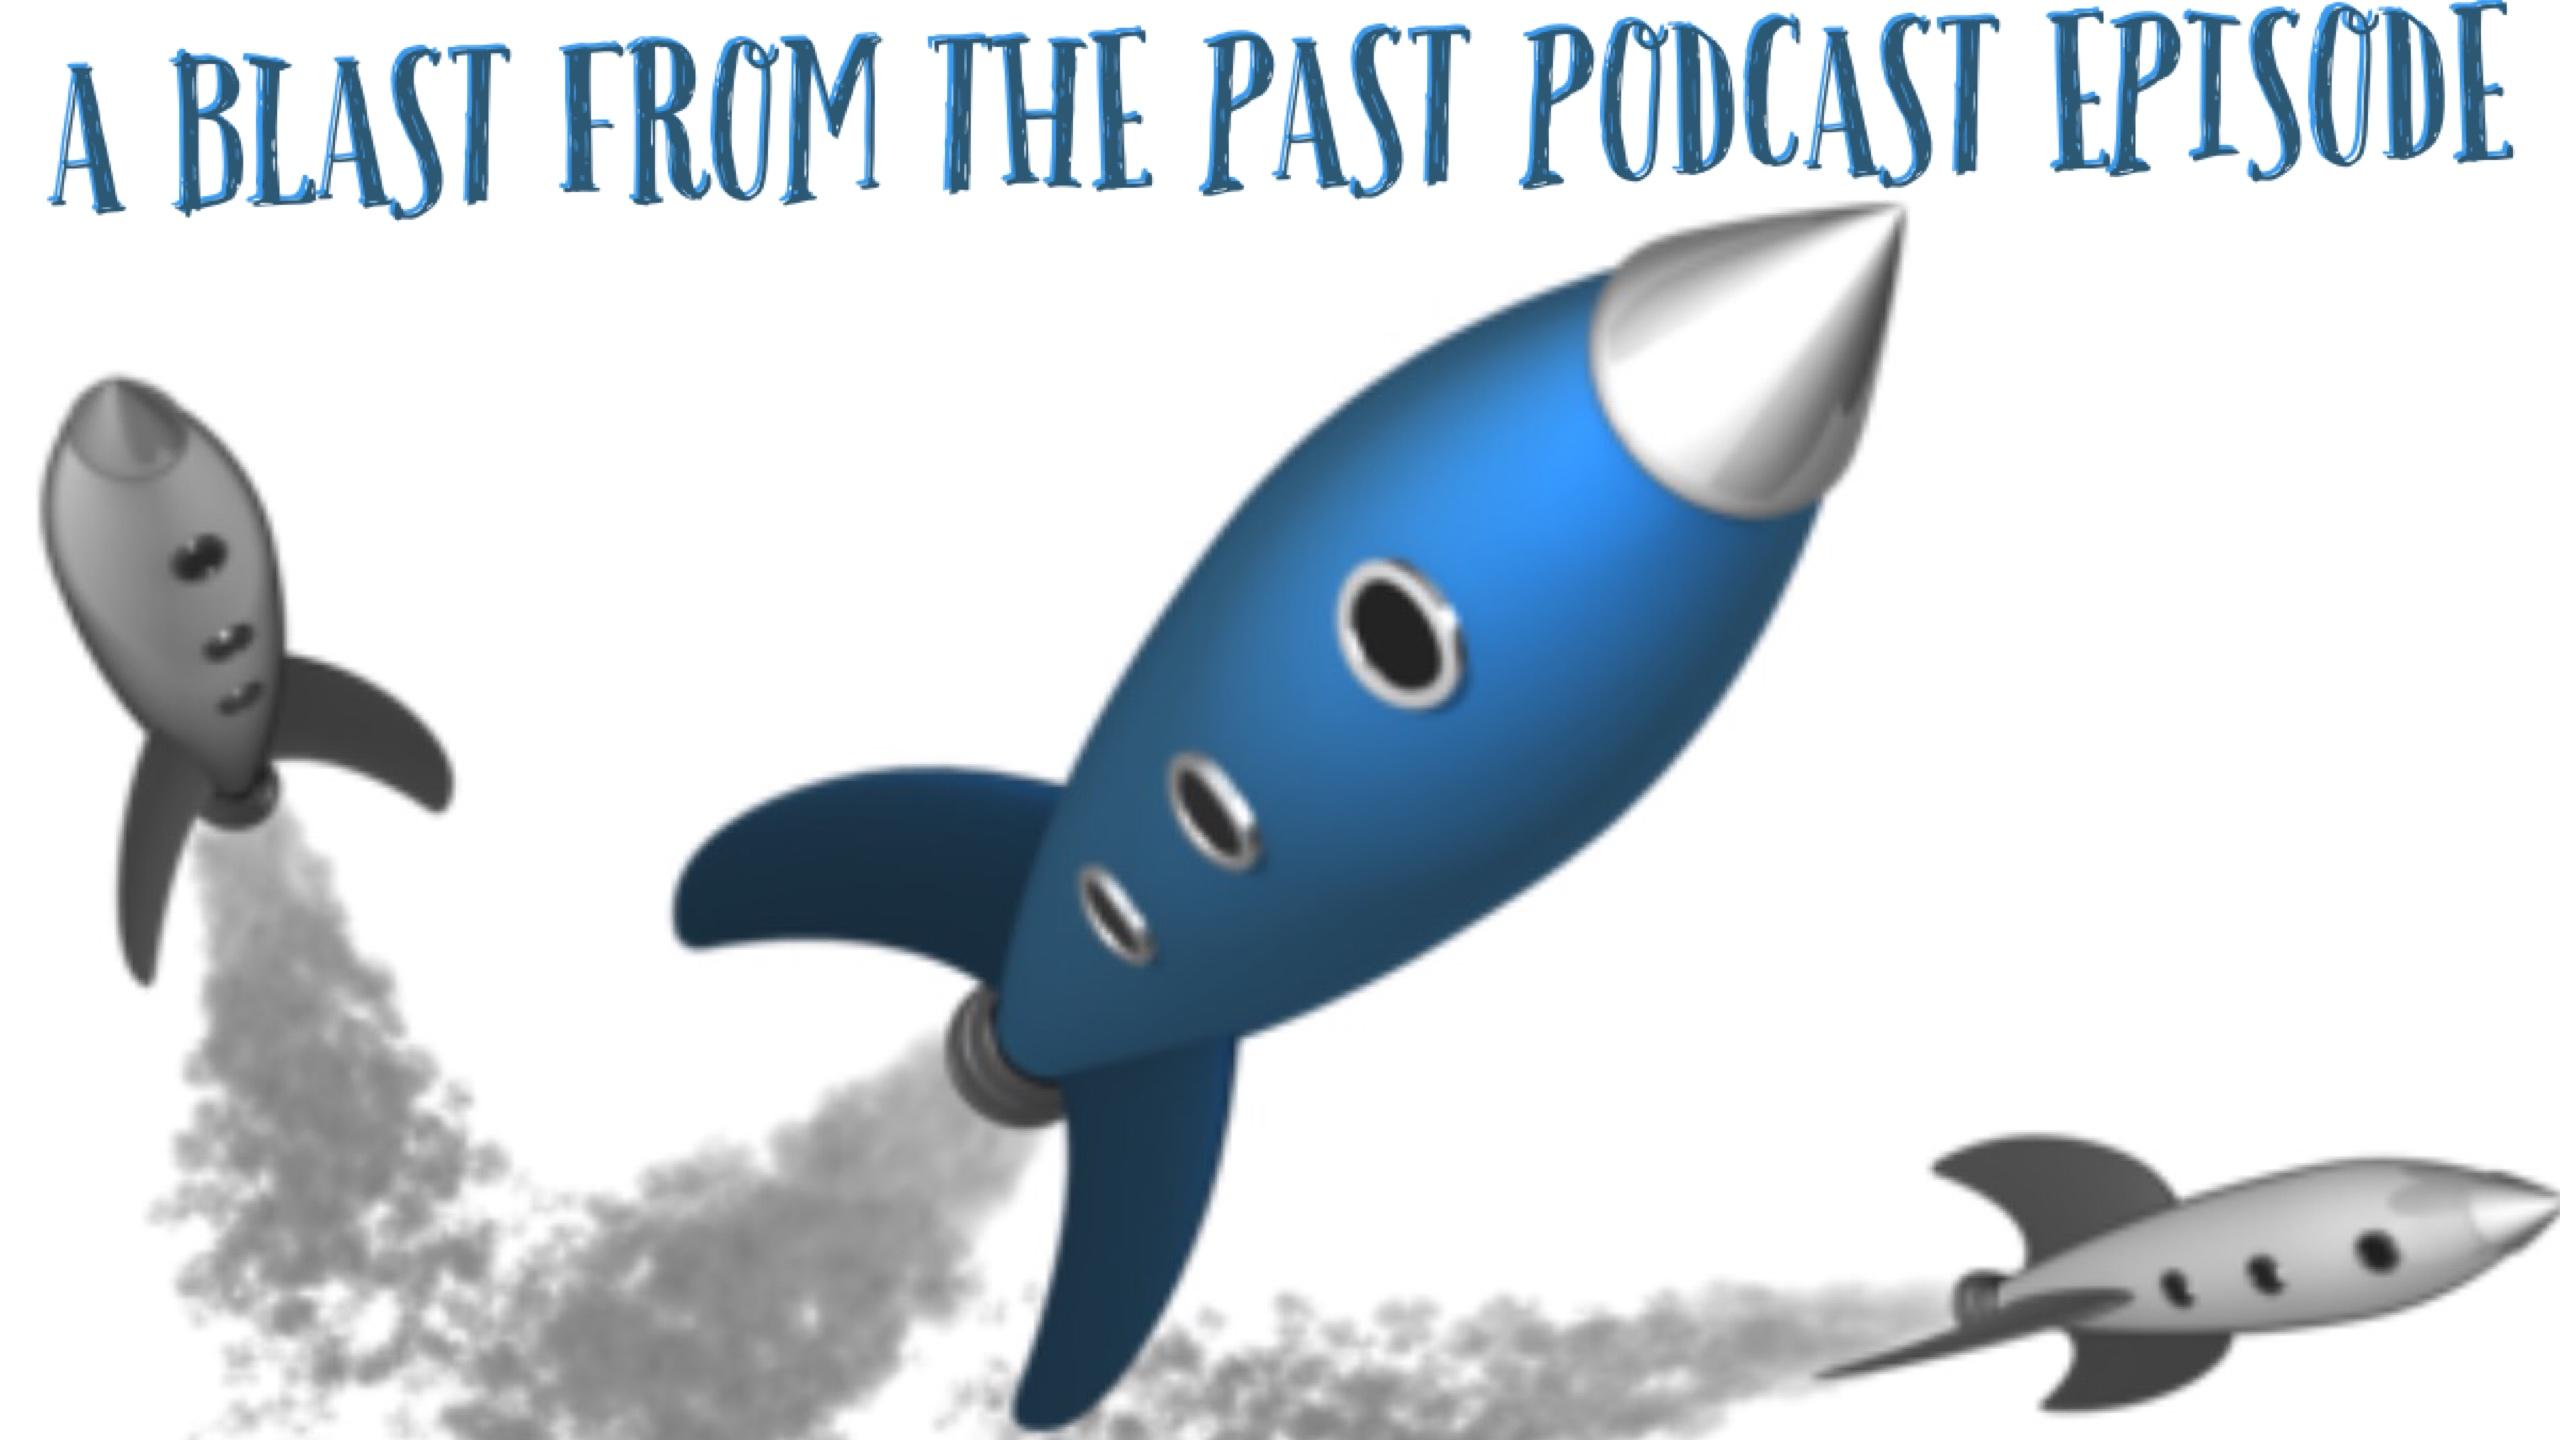 Episode 194 Free Podcast Episode